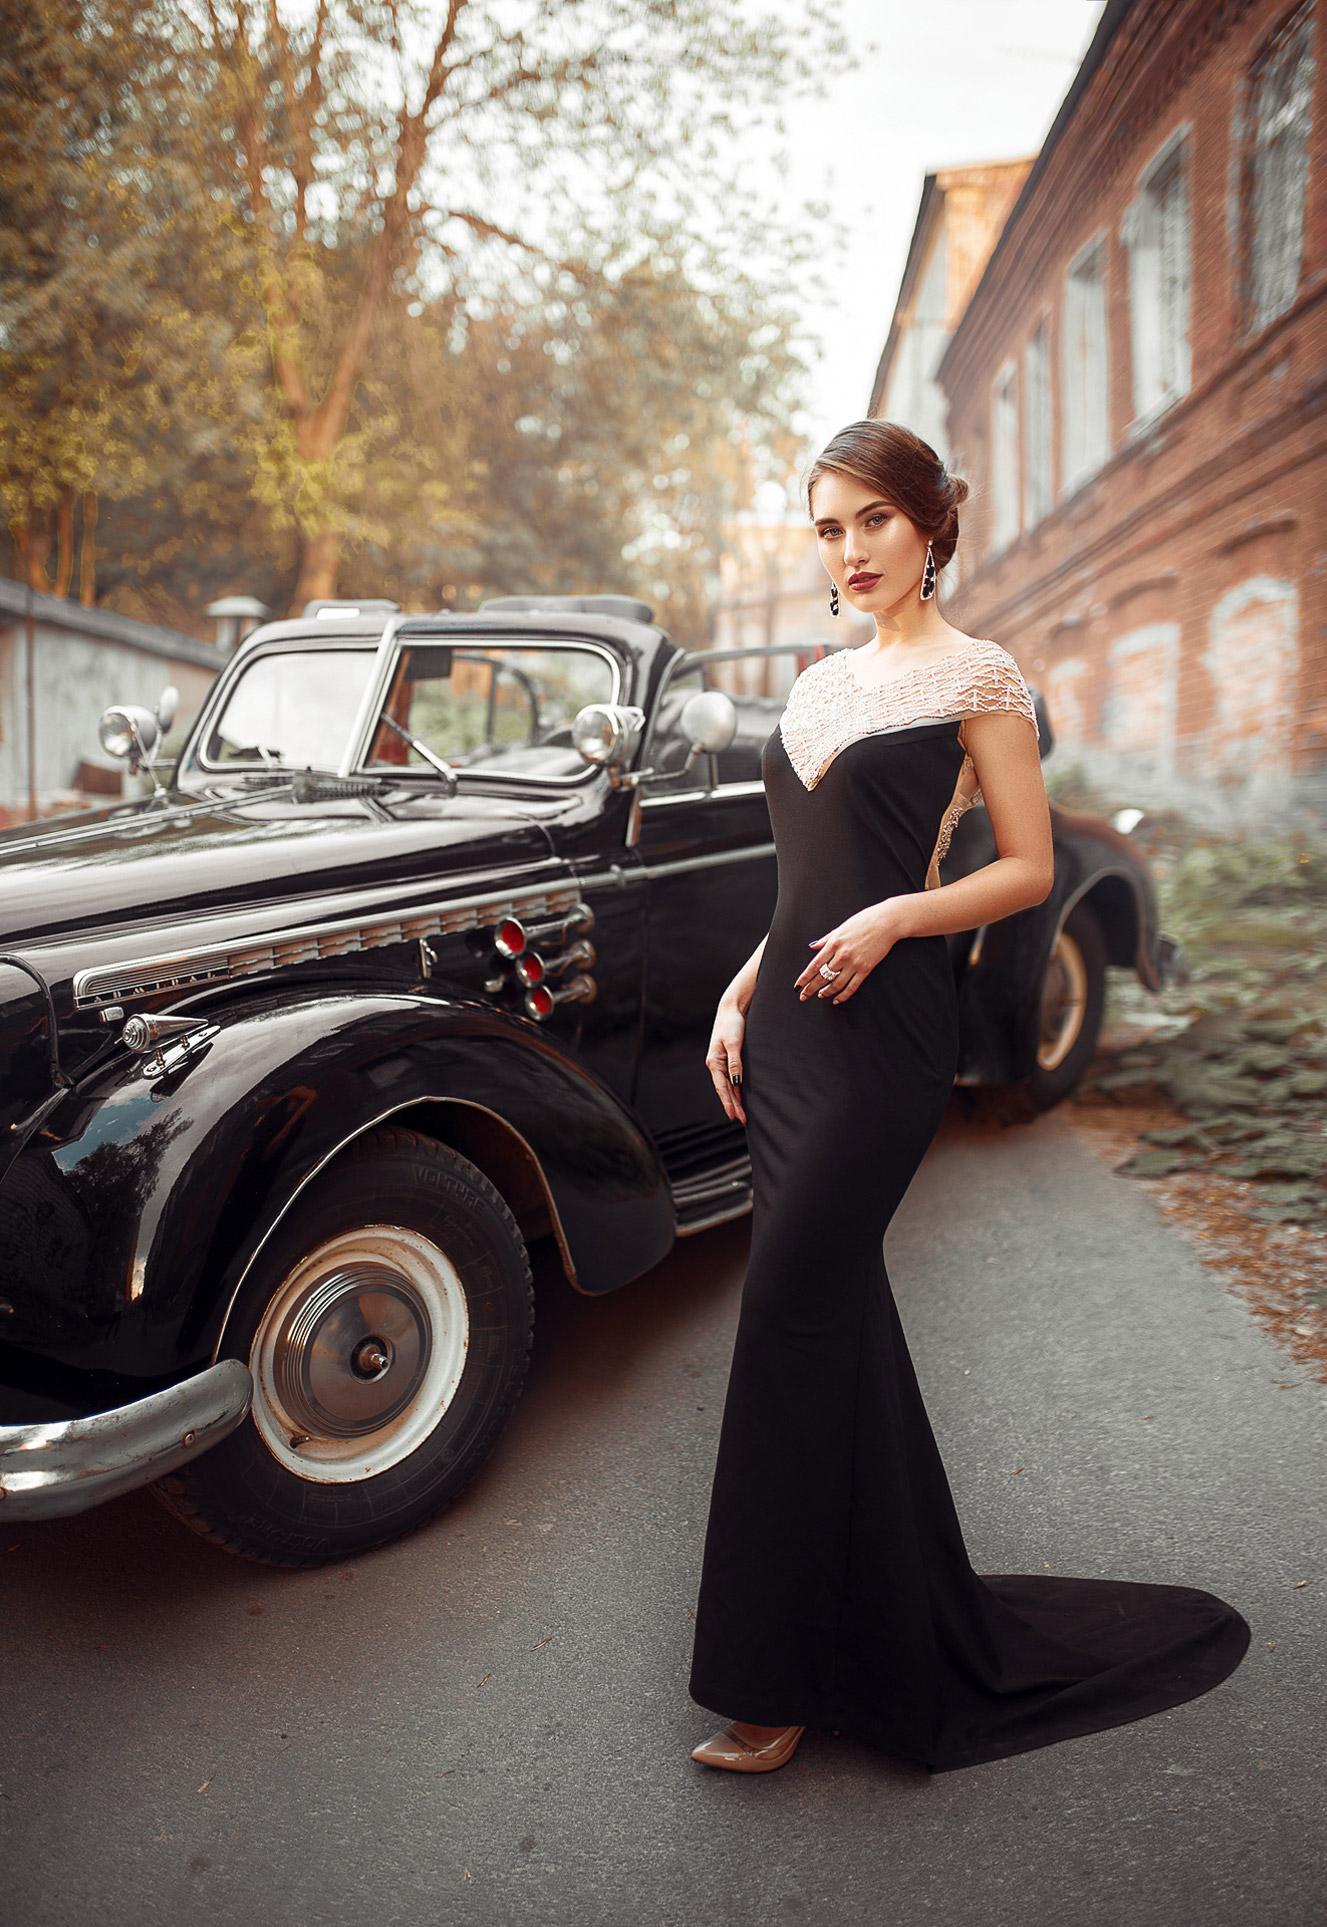 Retro car by Maks Kuzin